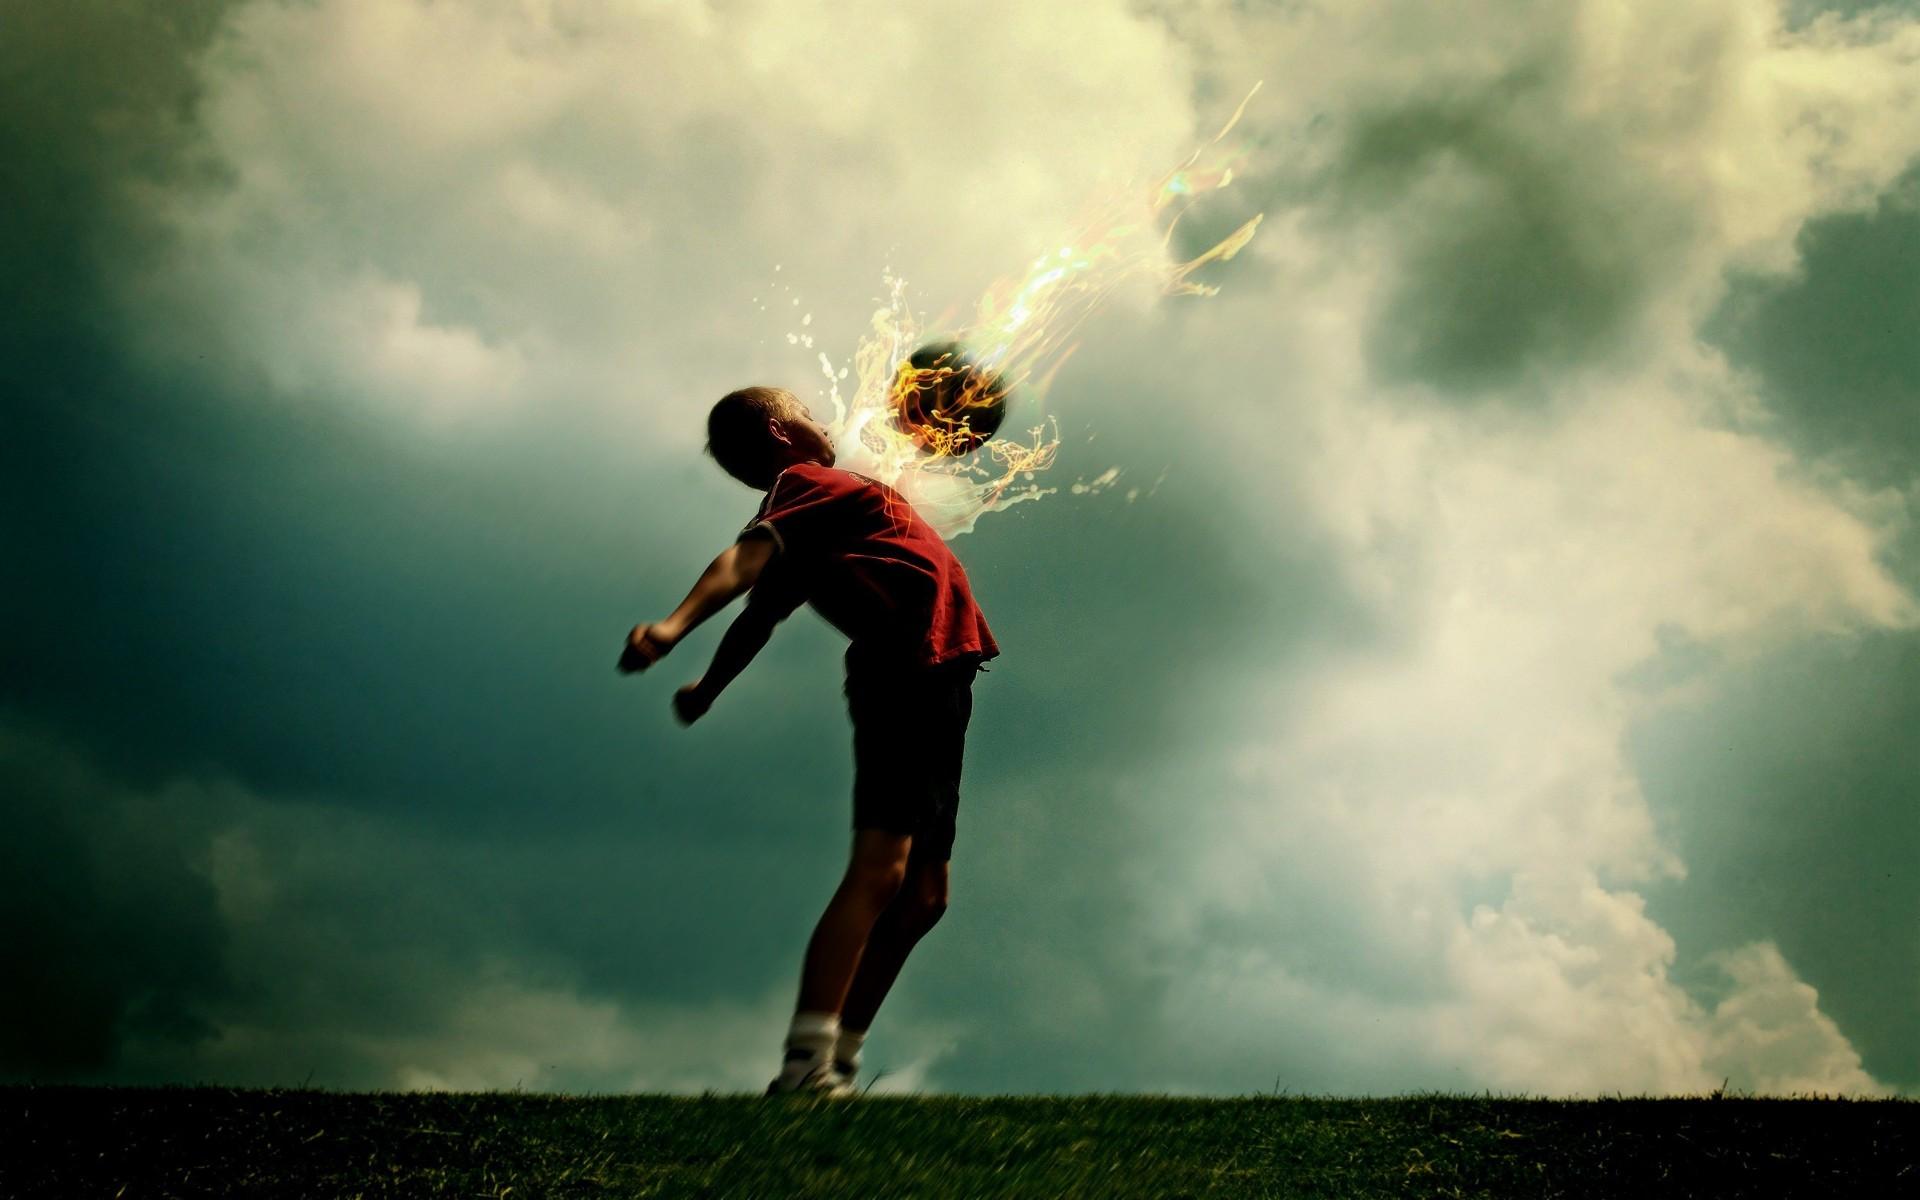 foot-ball-pasion_fond-ecran_photo